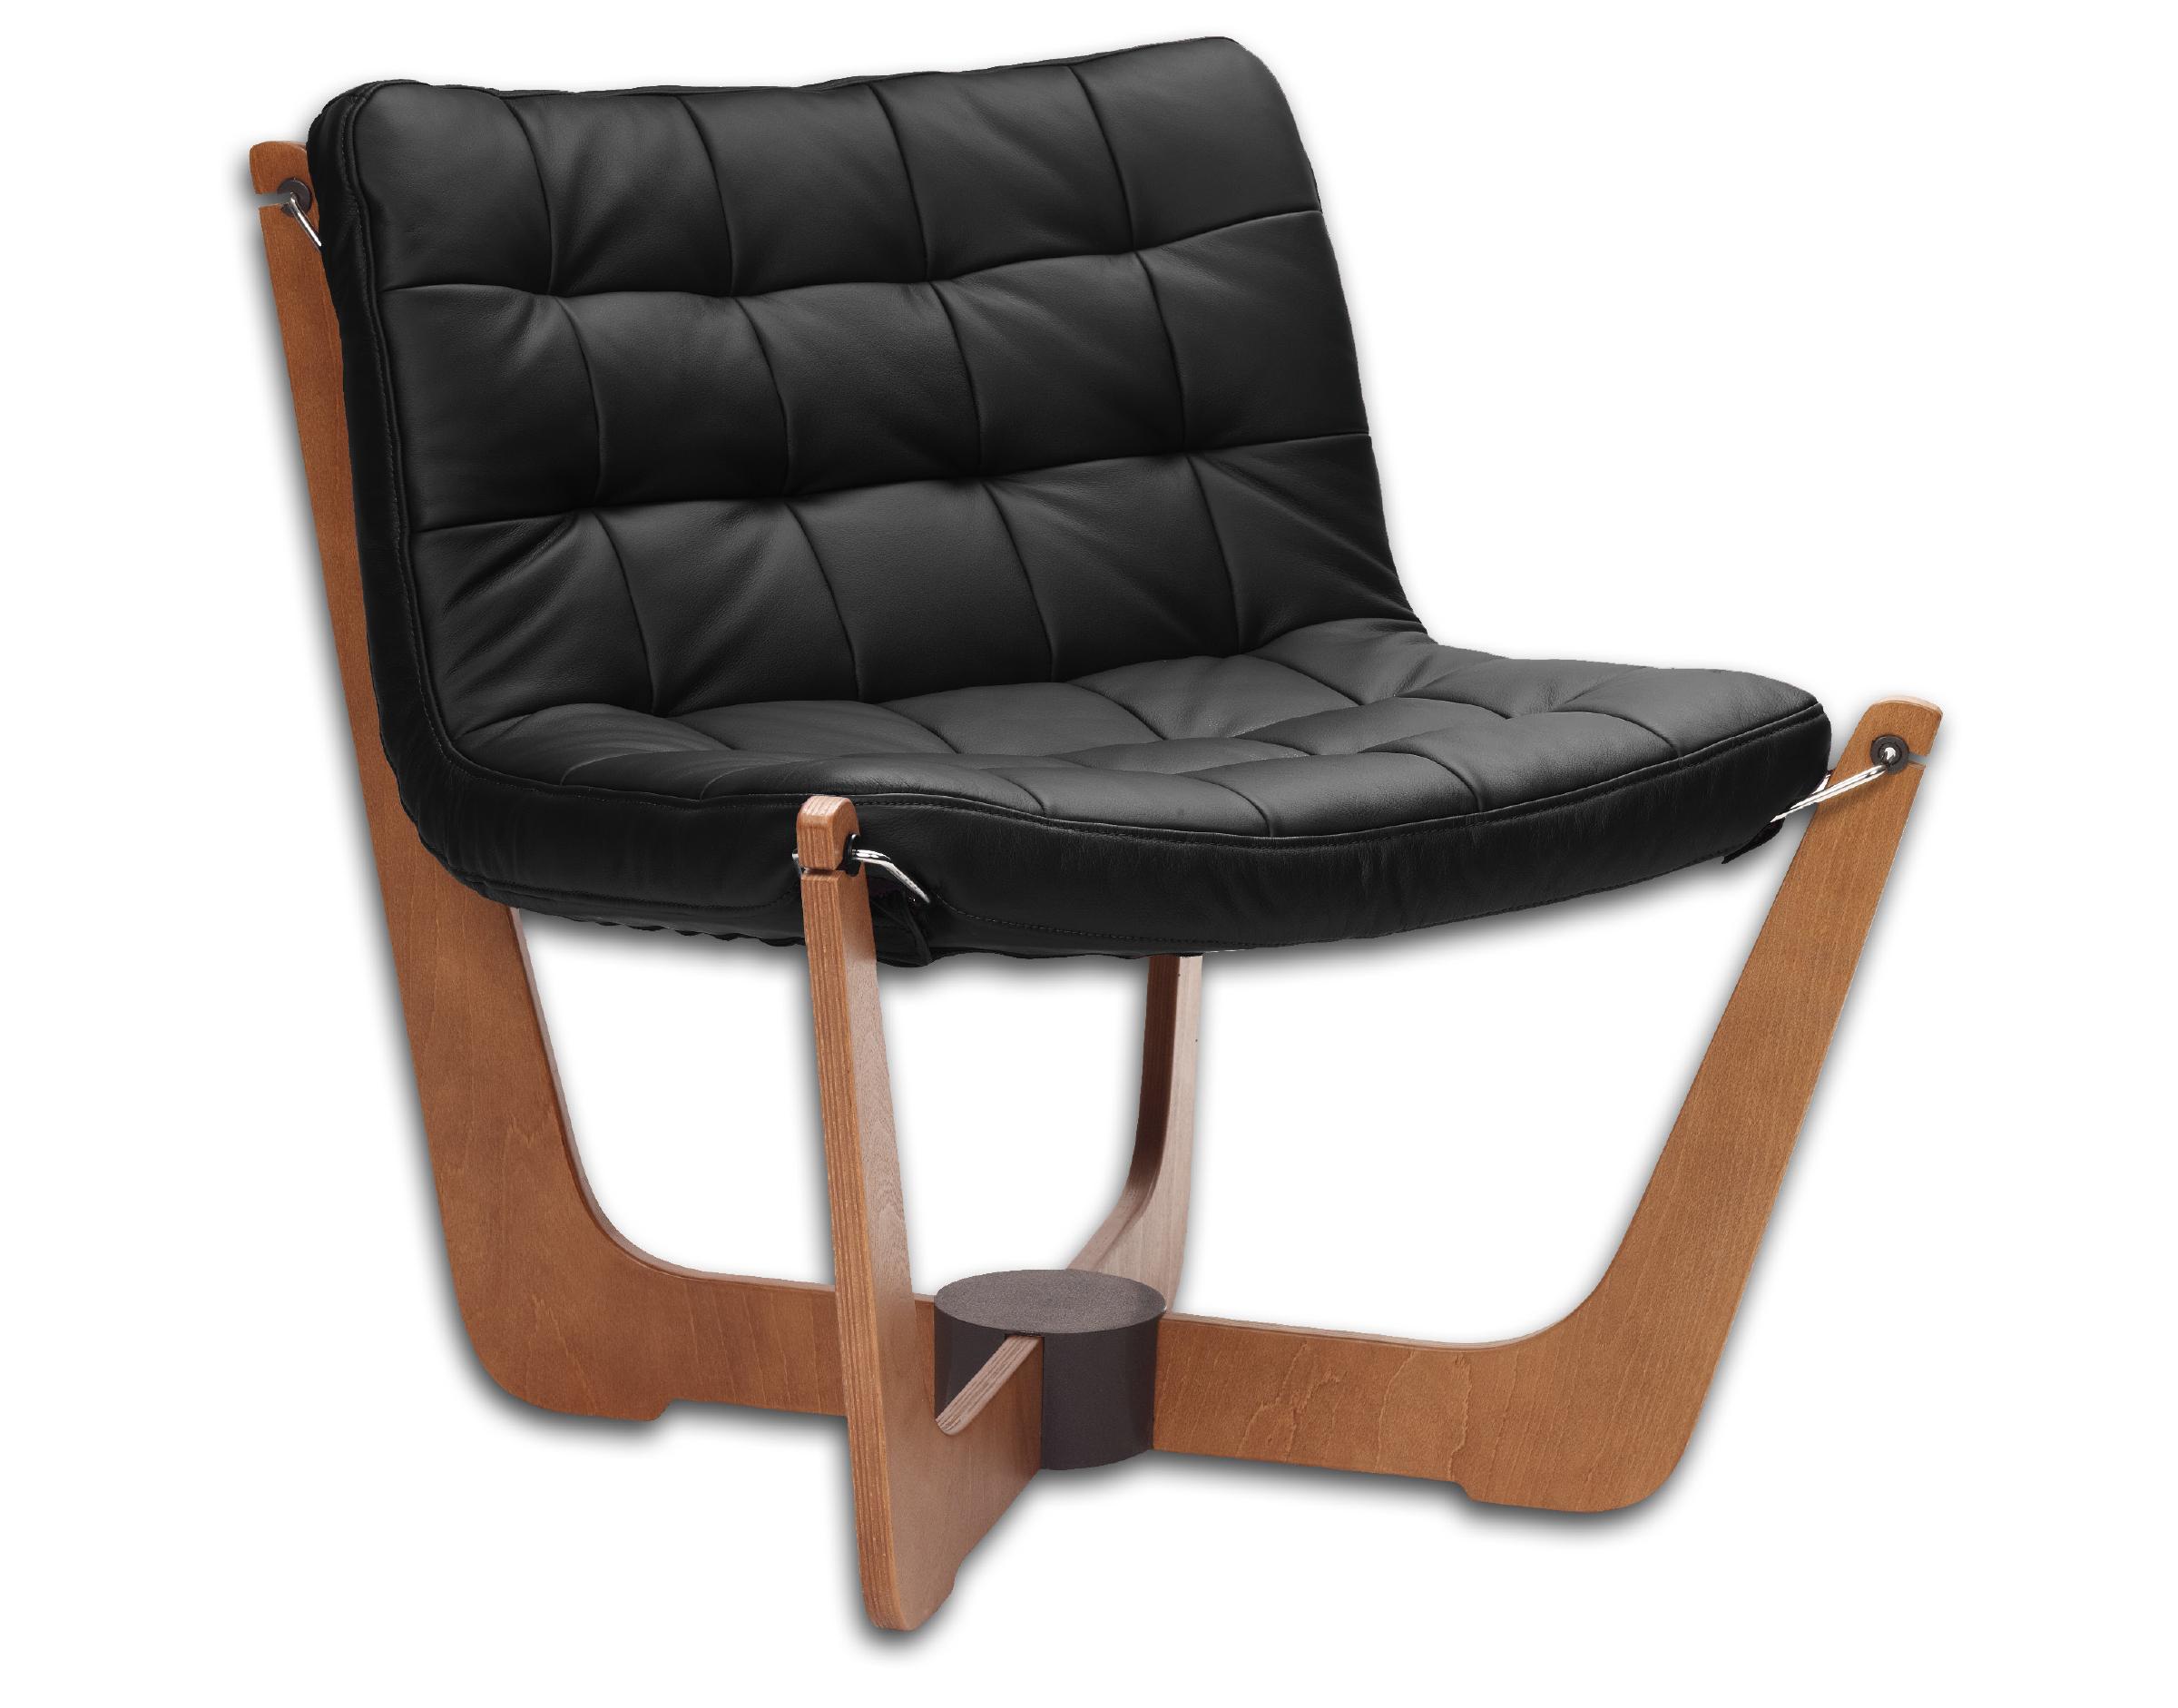 office chairs phoenix arizona ice fishing chair fjords hjellegjerde classics collection scandinavian